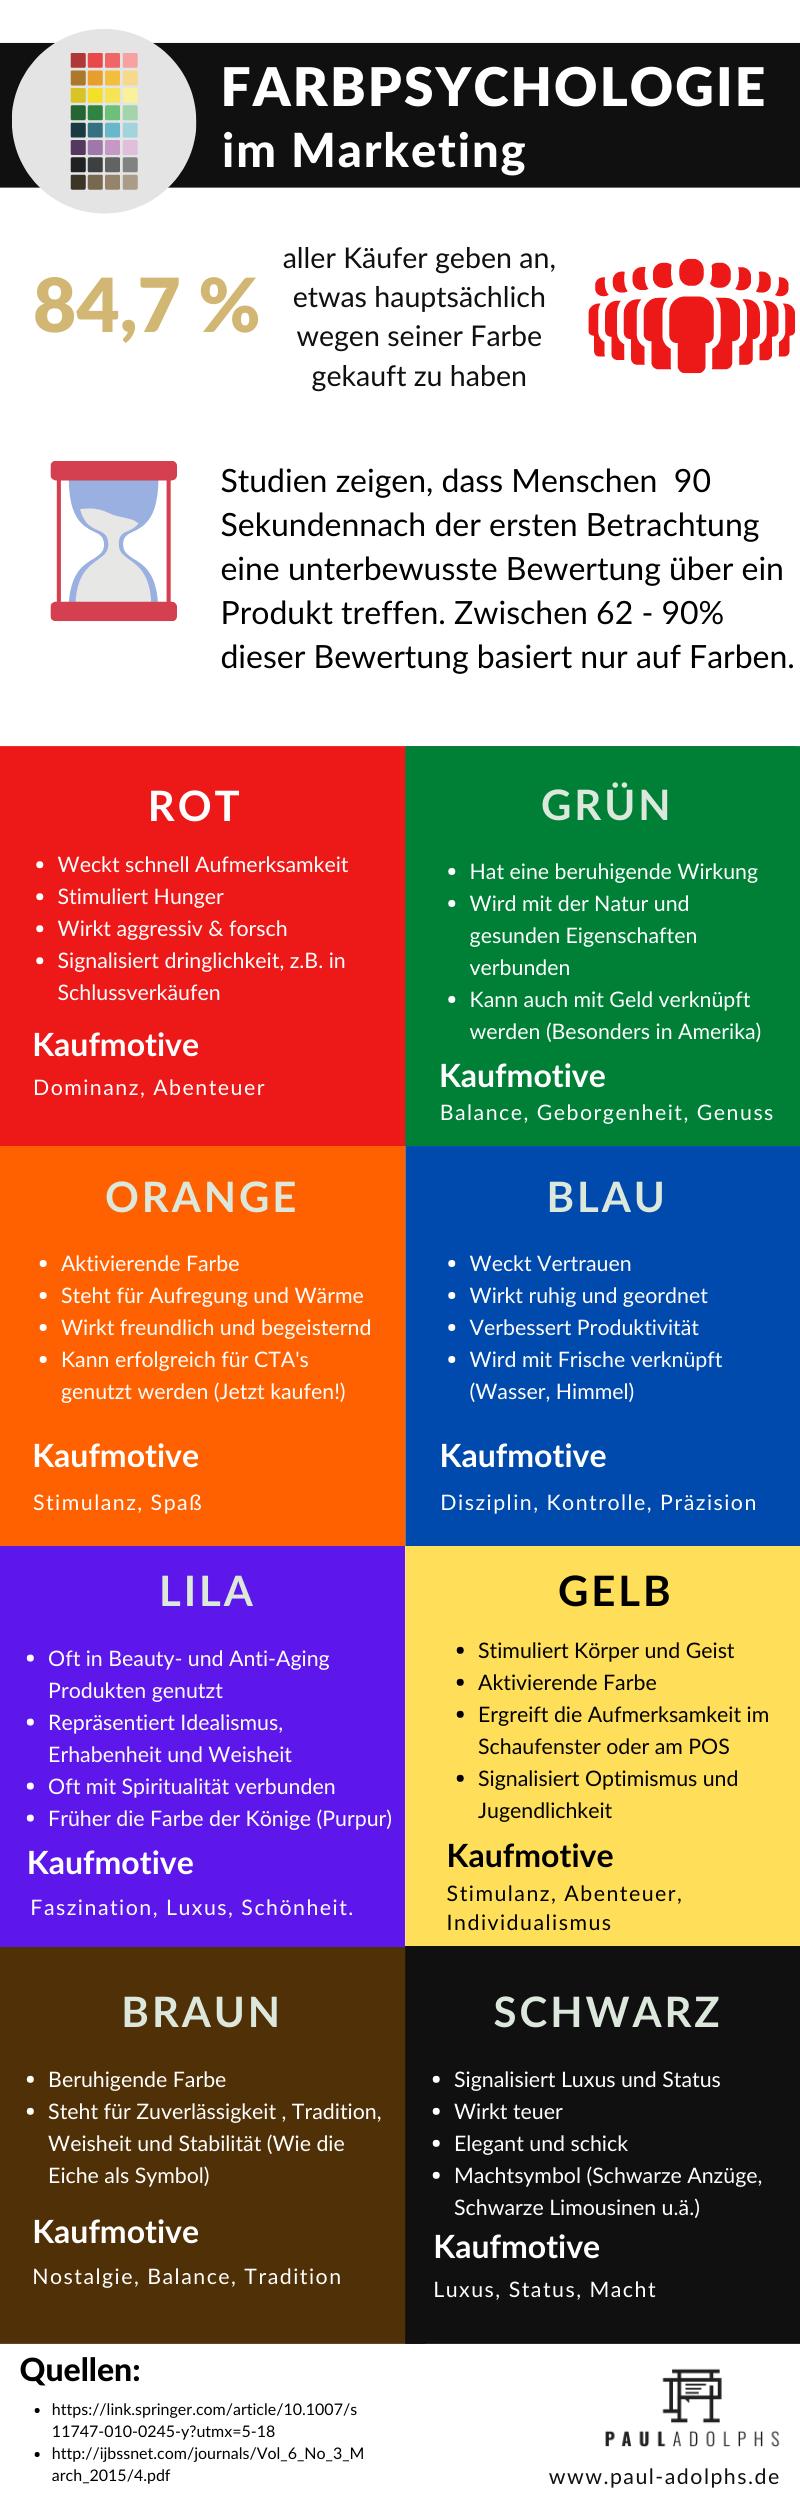 Farbpsychologie im Marketing Infografik